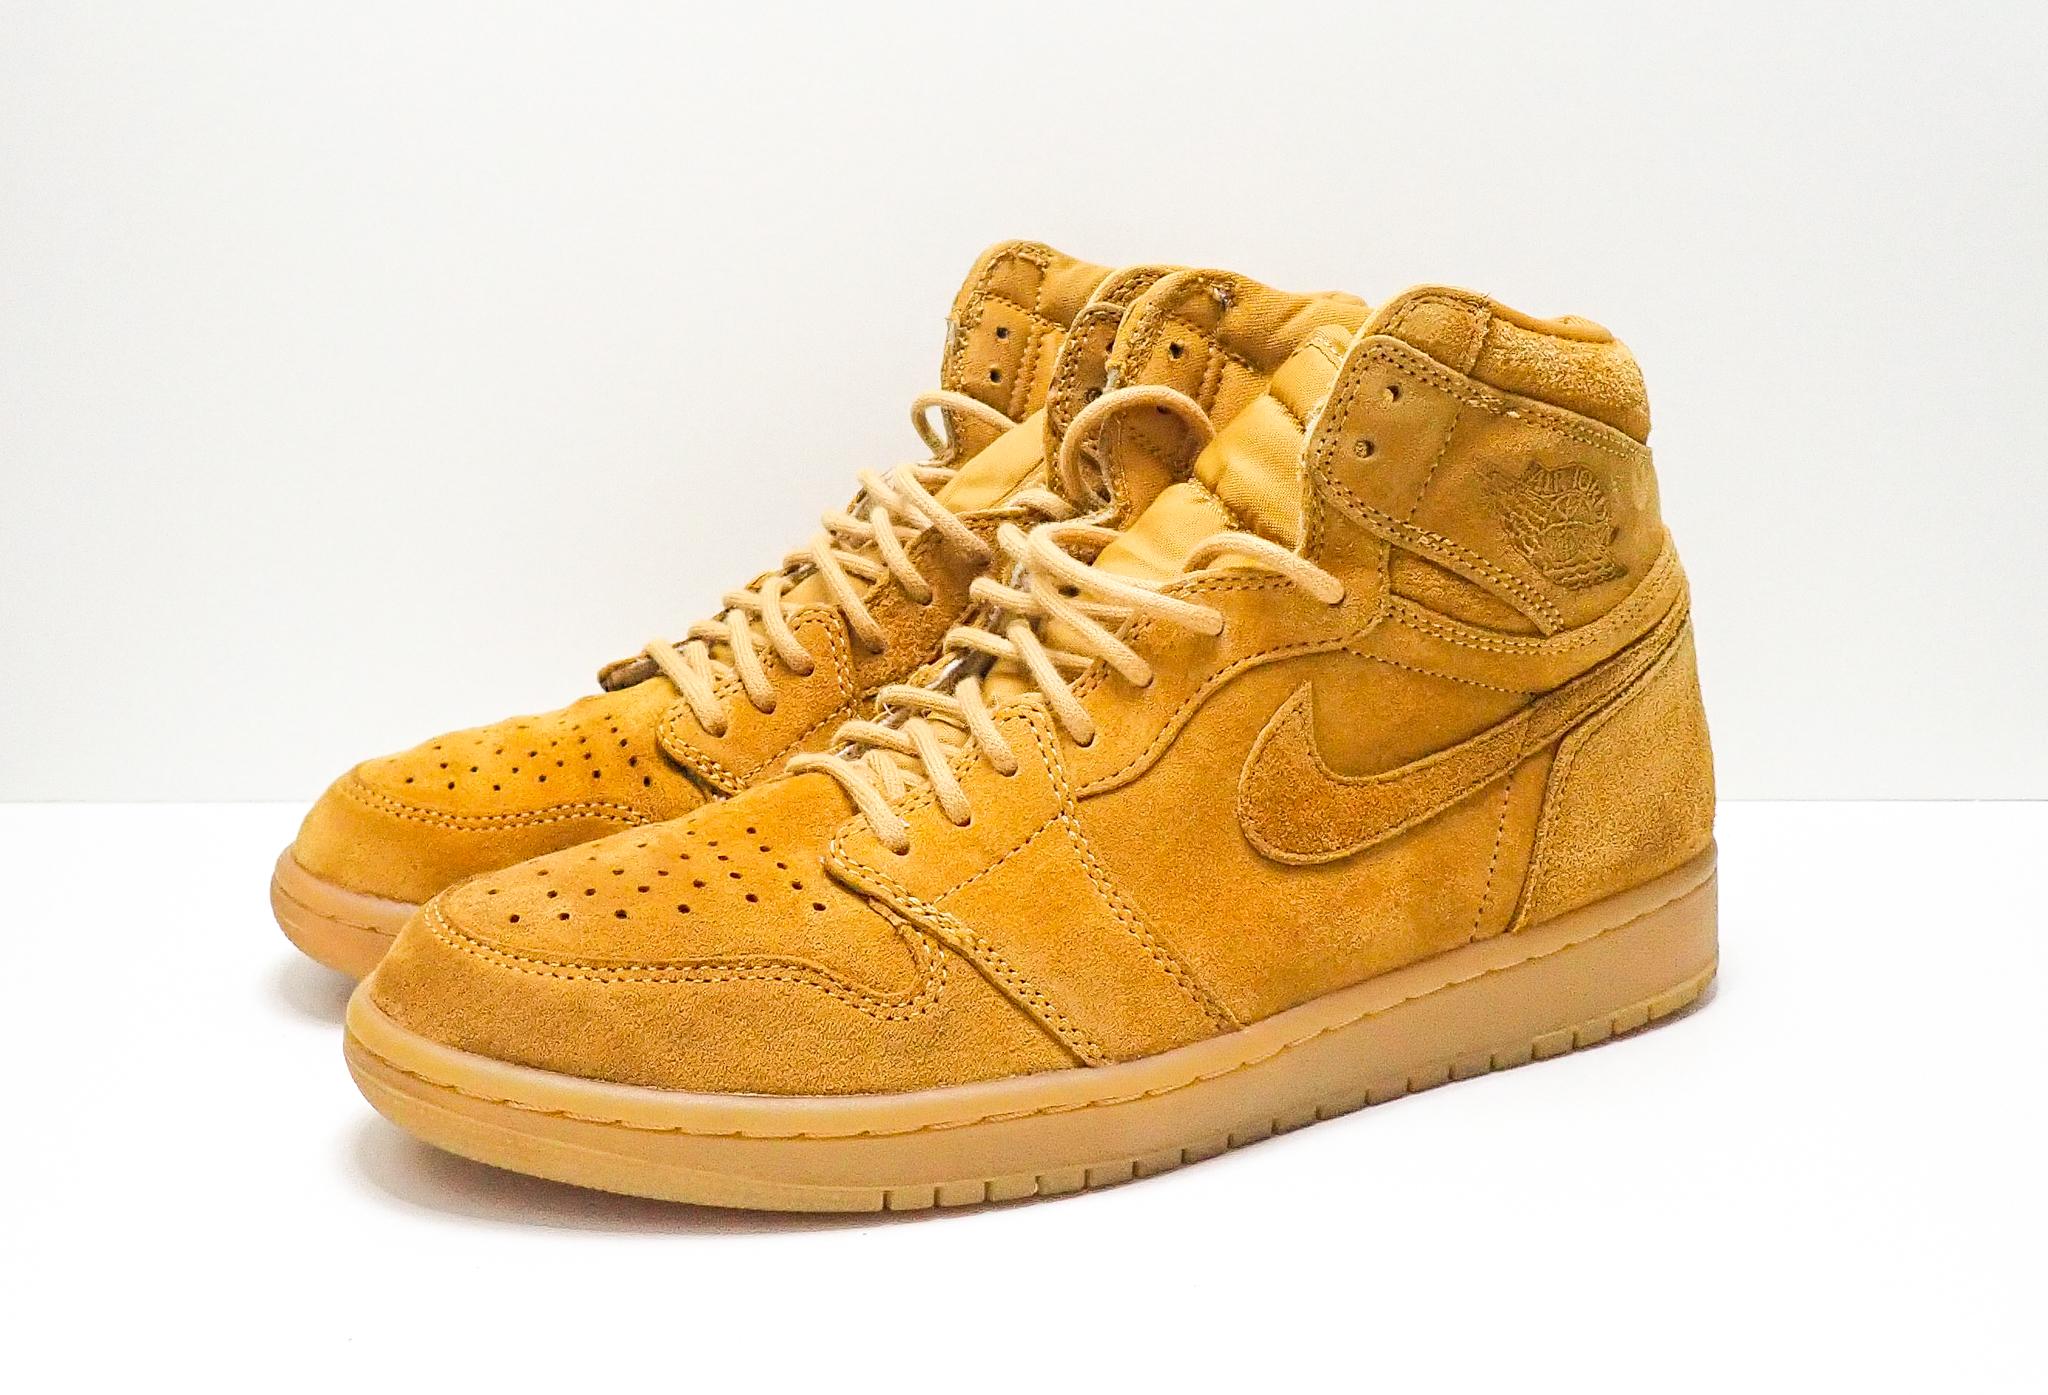 Jordan 1 Retro Wheat